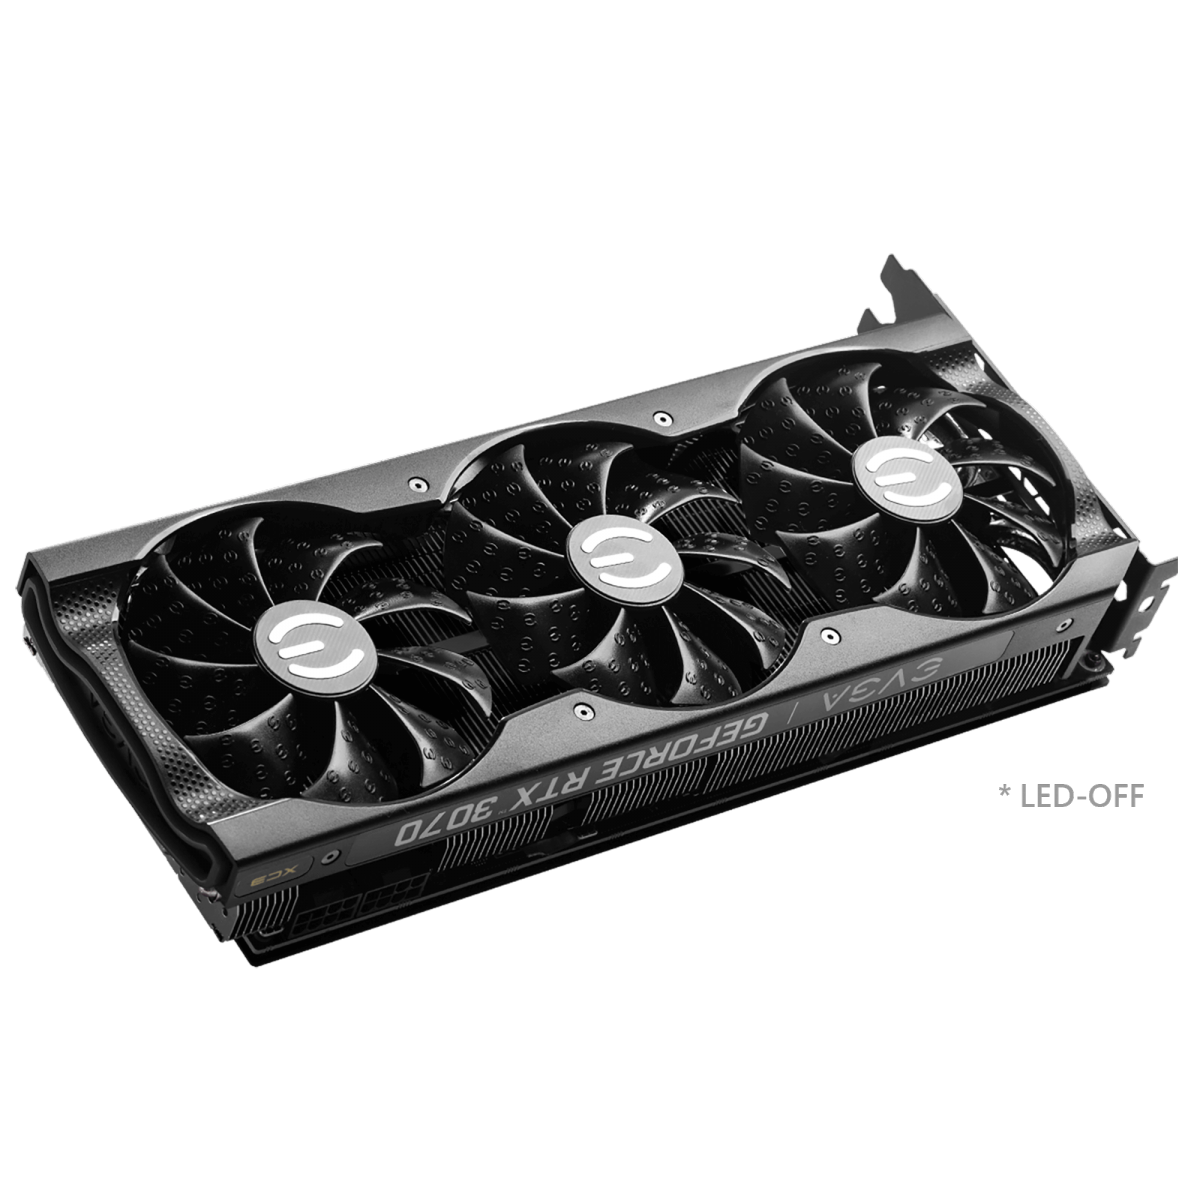 Placa de Vídeo EVGA GeForce RTX 3070 XC3 ULTRA GAMING, 8GB, GDDR6, 256bit, 08G-P5-3755-KR